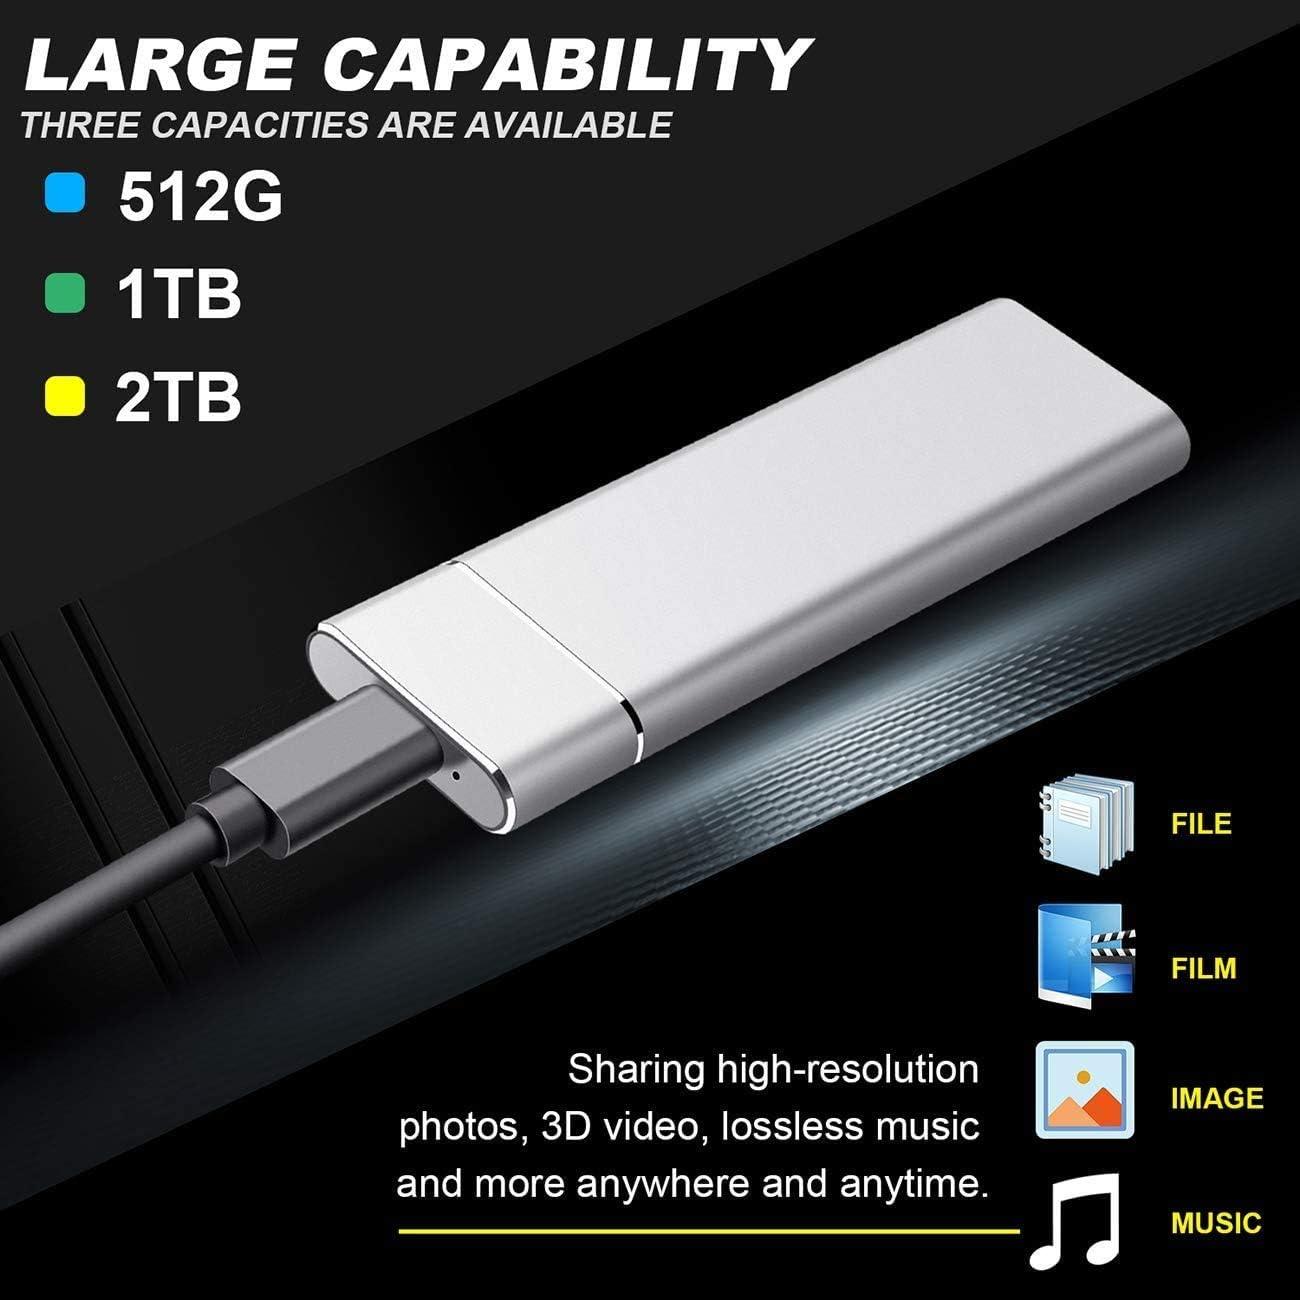 Mac 1tb, Negro Disco Duro Externo 1tb Type C USB 3.1 para PC MacBook Xbox Chromebook